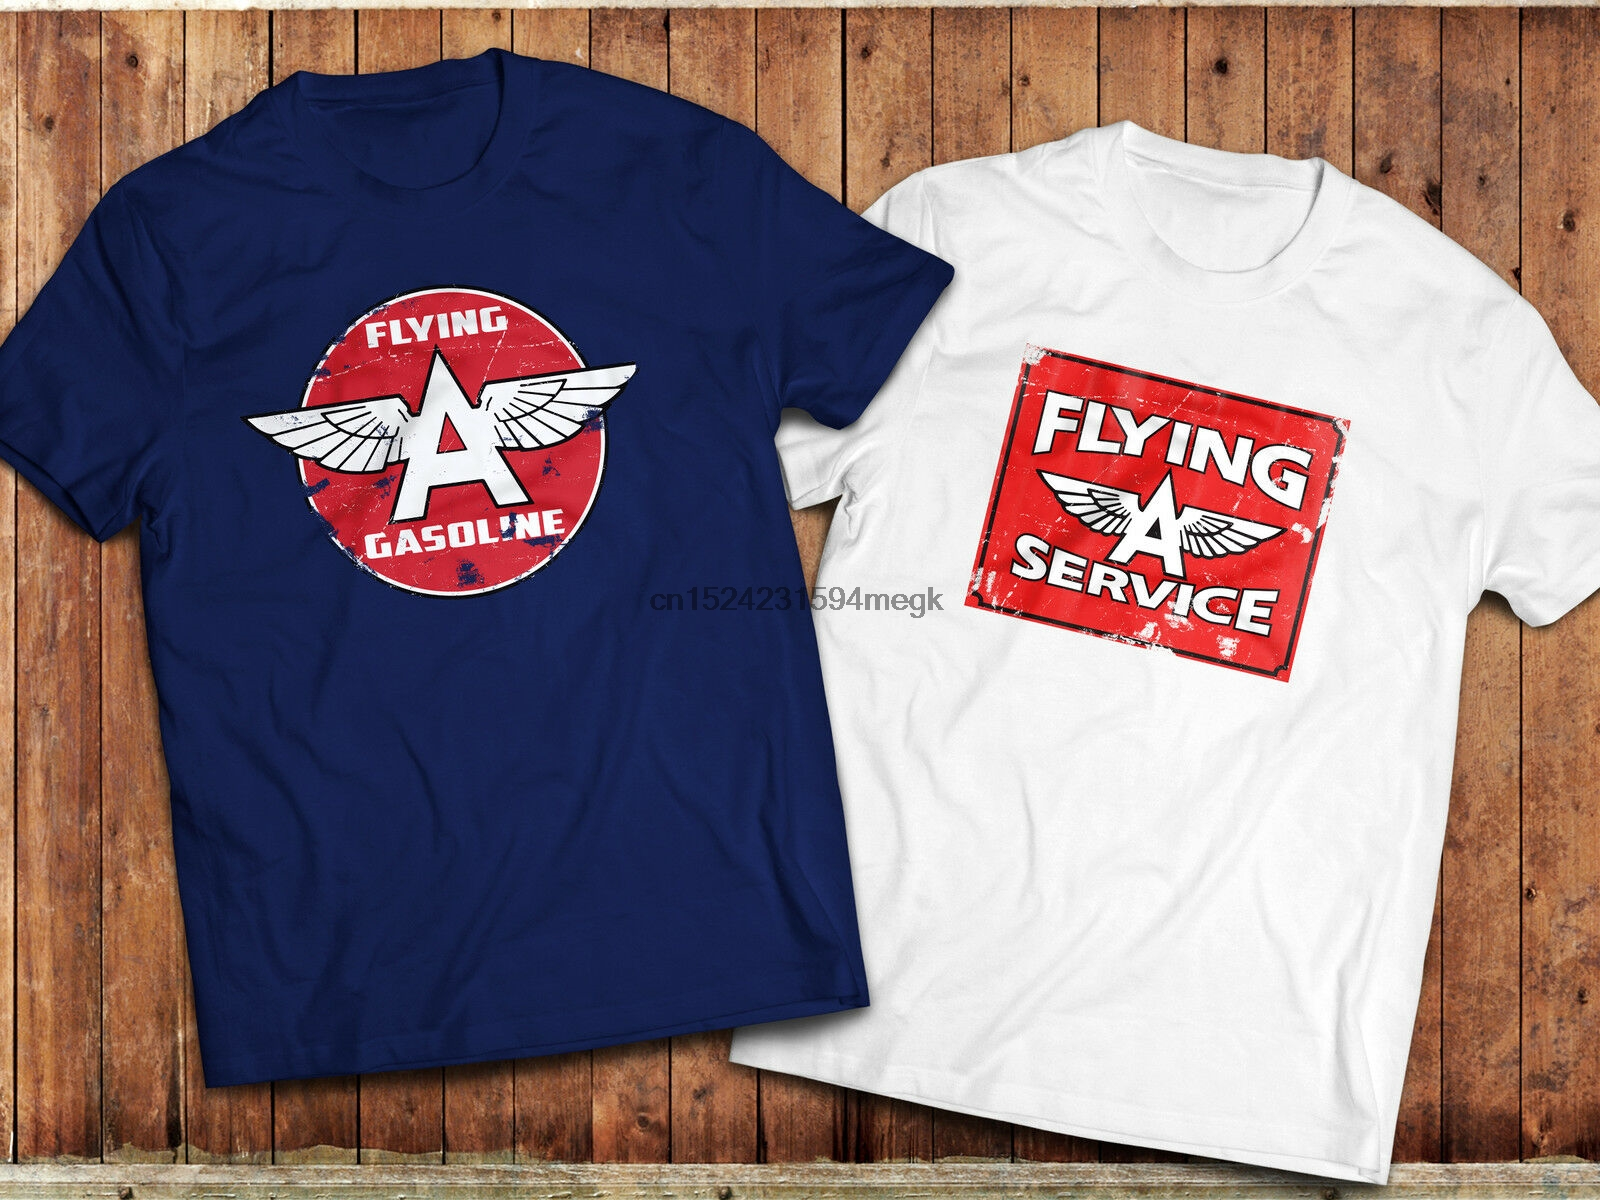 'FLYING A' T-Shirt Retro Gas Petrol brand Logo Vintage Oil Car Motorsport